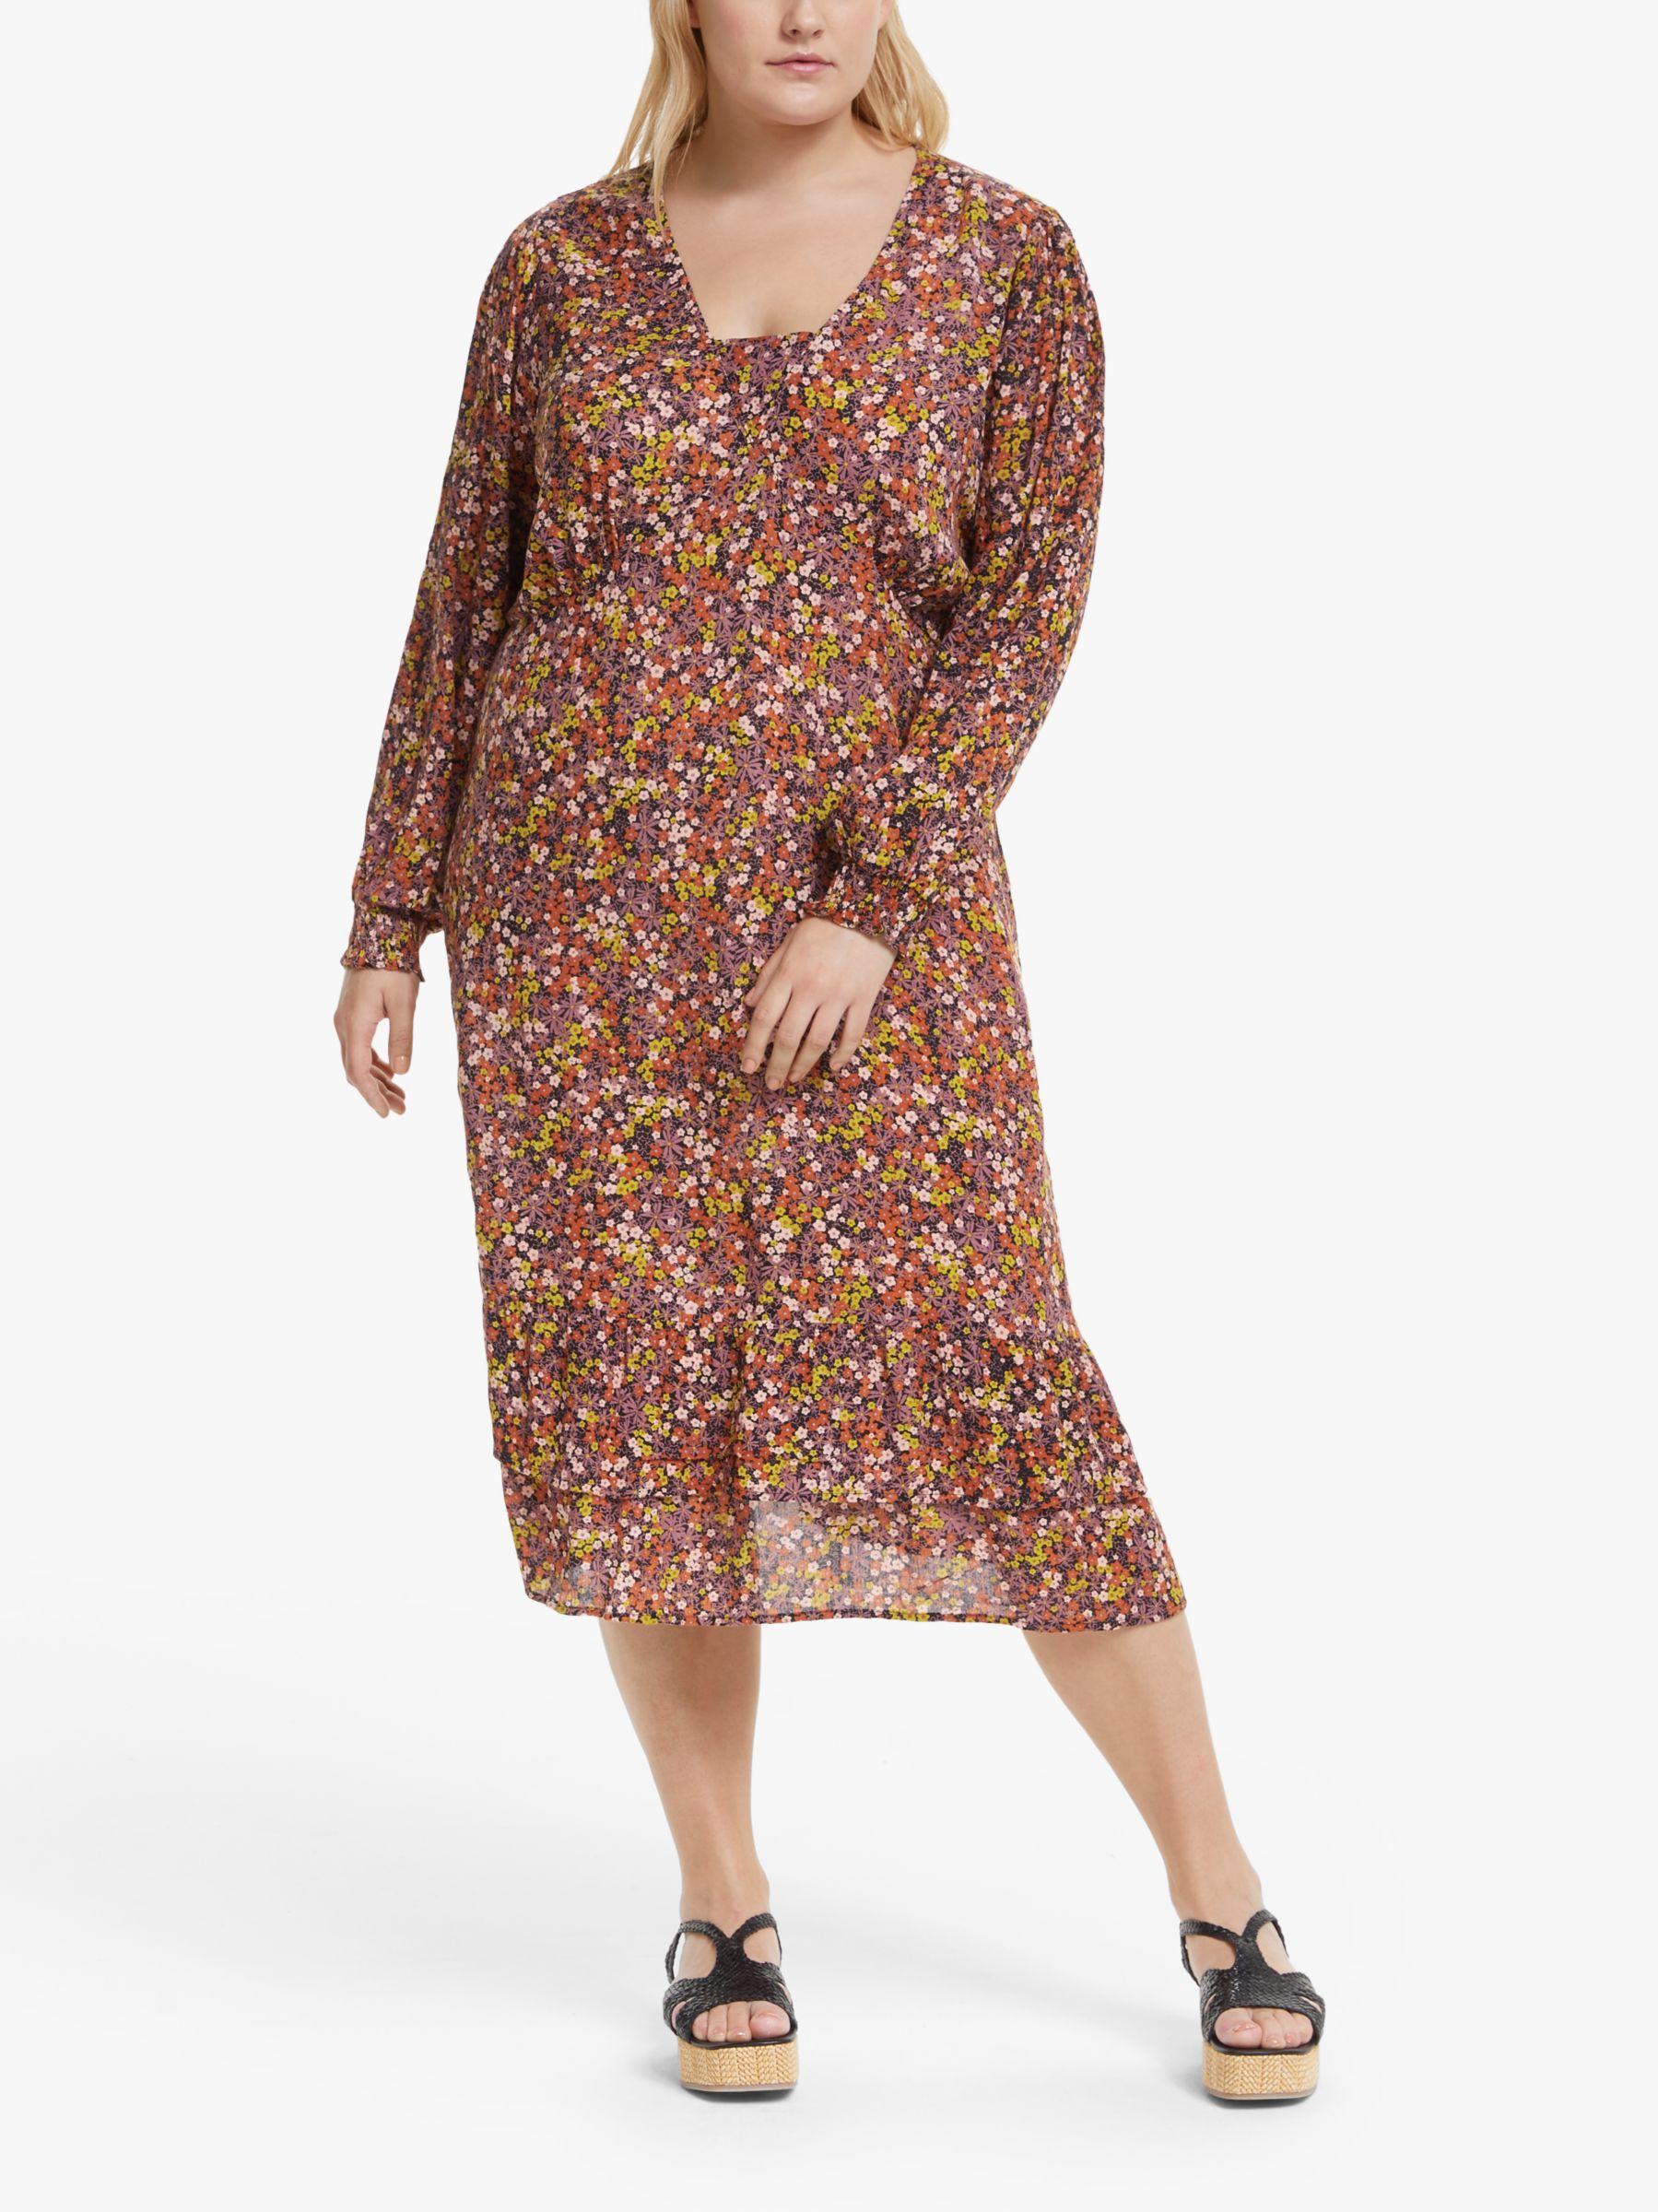 Junarose JUNAROSE Curve Aria Floral Print Midi Dress, Dusty Orchid